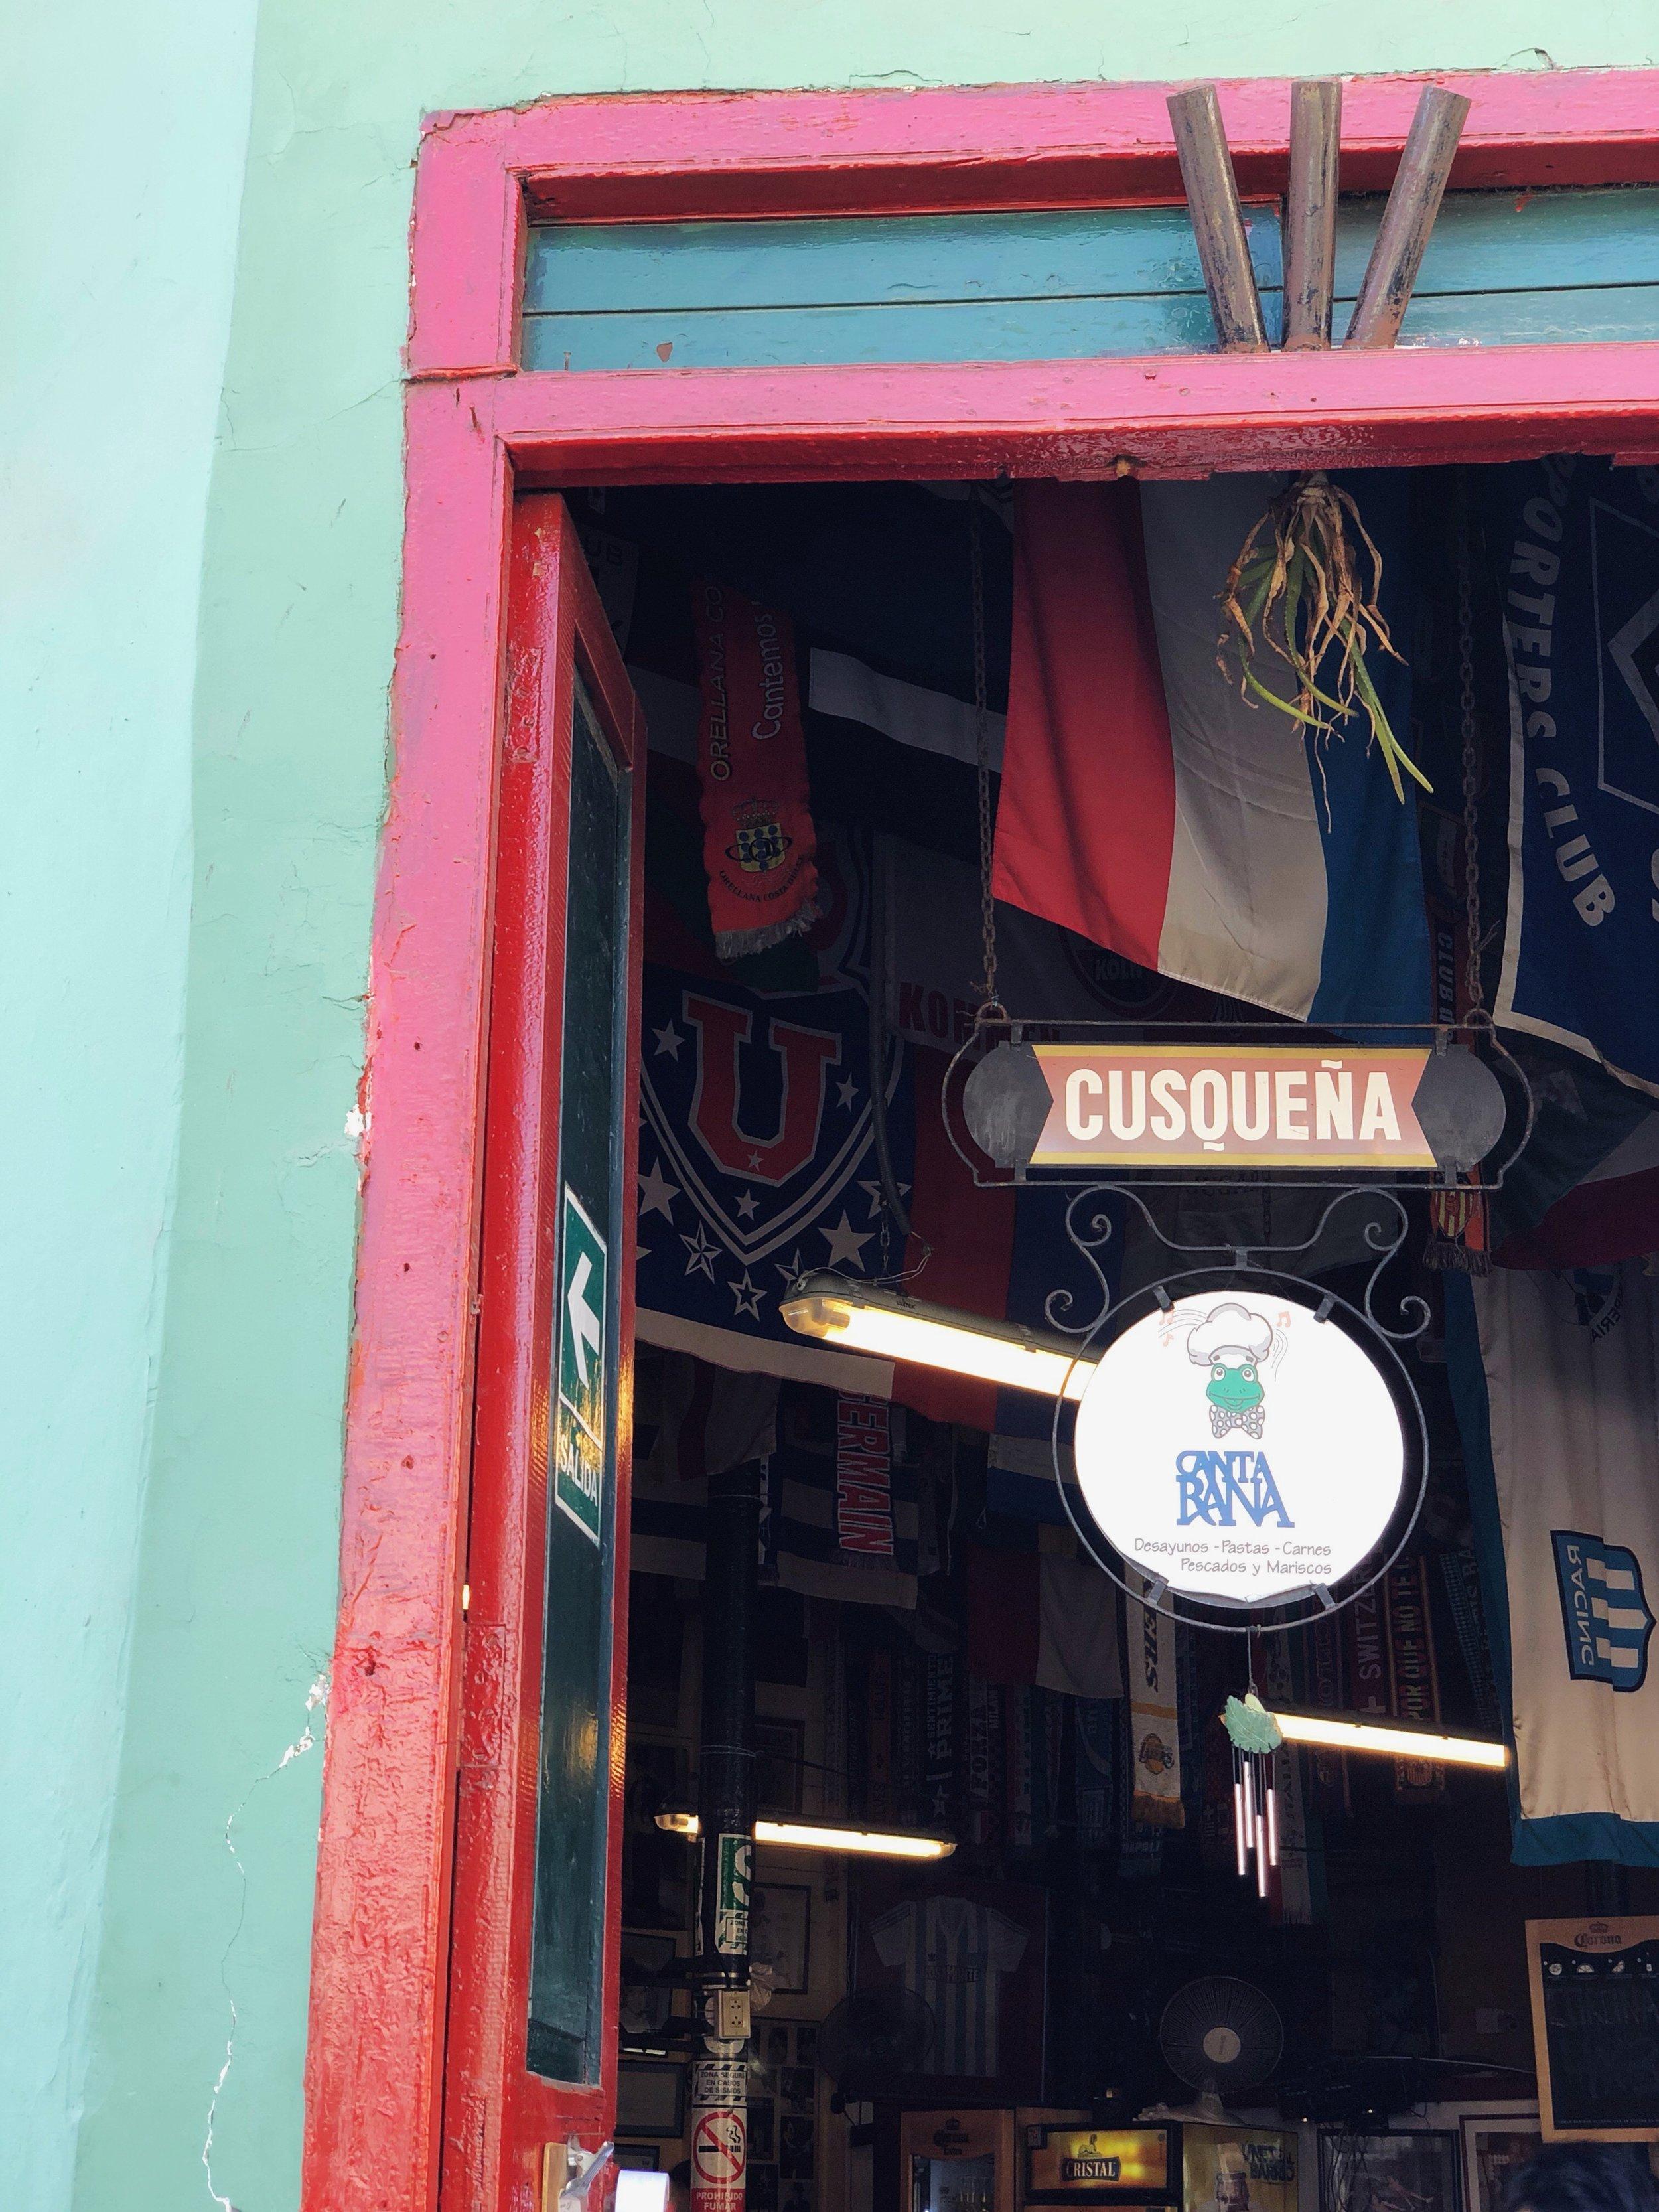 canta rana-lunch-food-south america-peru-lima-barranco